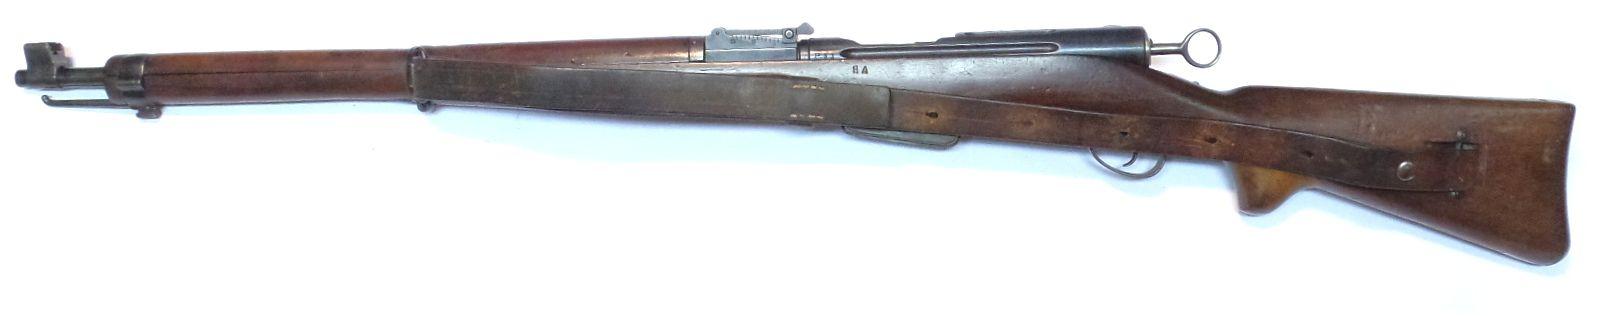 Schmidt Rubin - K11 calibre 22LR